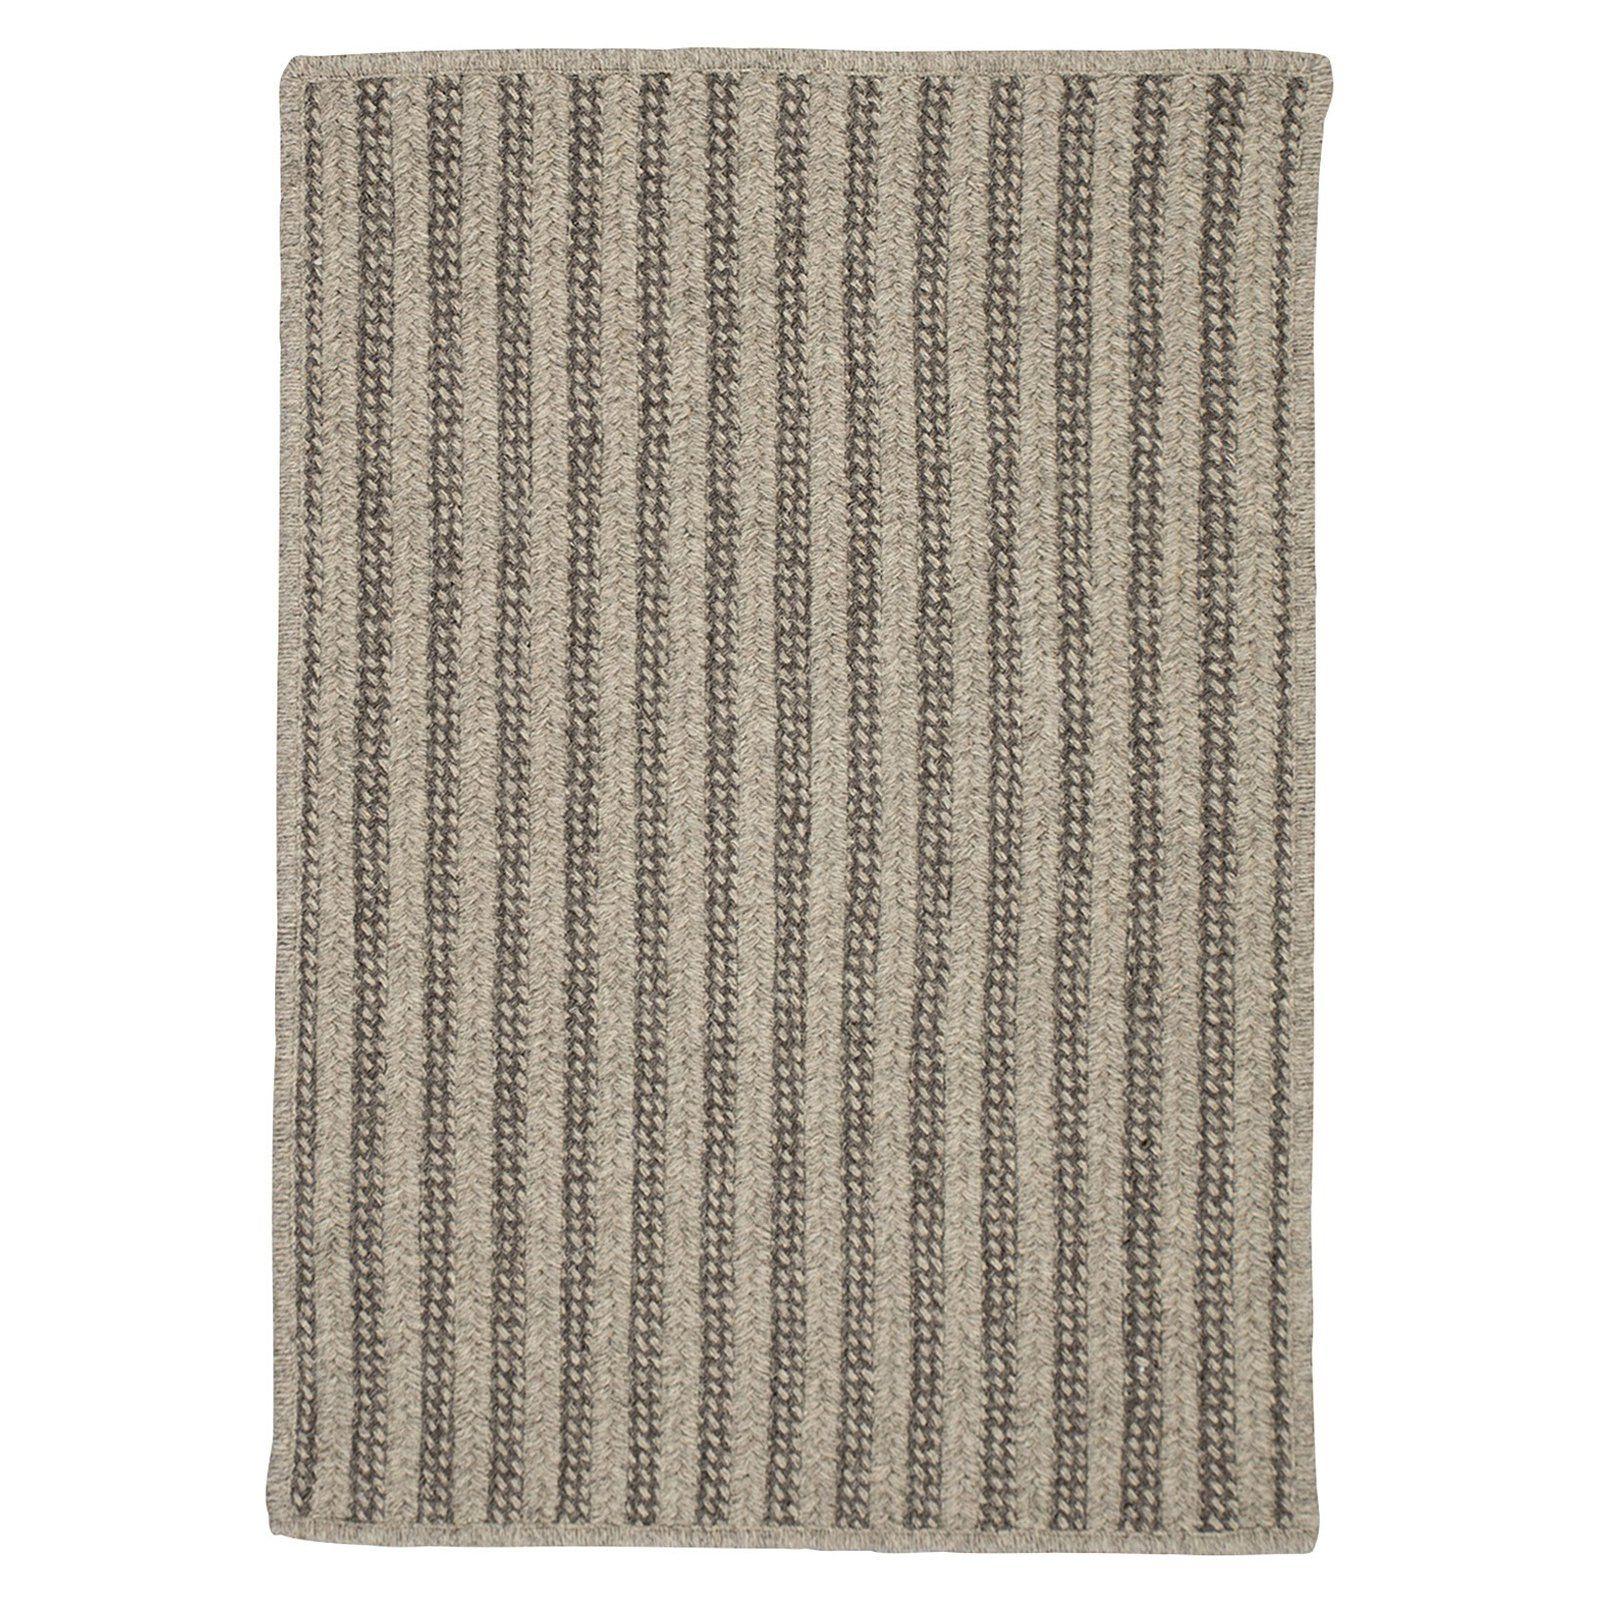 Colonial Mills Woodland Vertical Stripe Indoor Area Rug Dark Gray Braided Area Rugs Area Rugs Wool Area Rugs